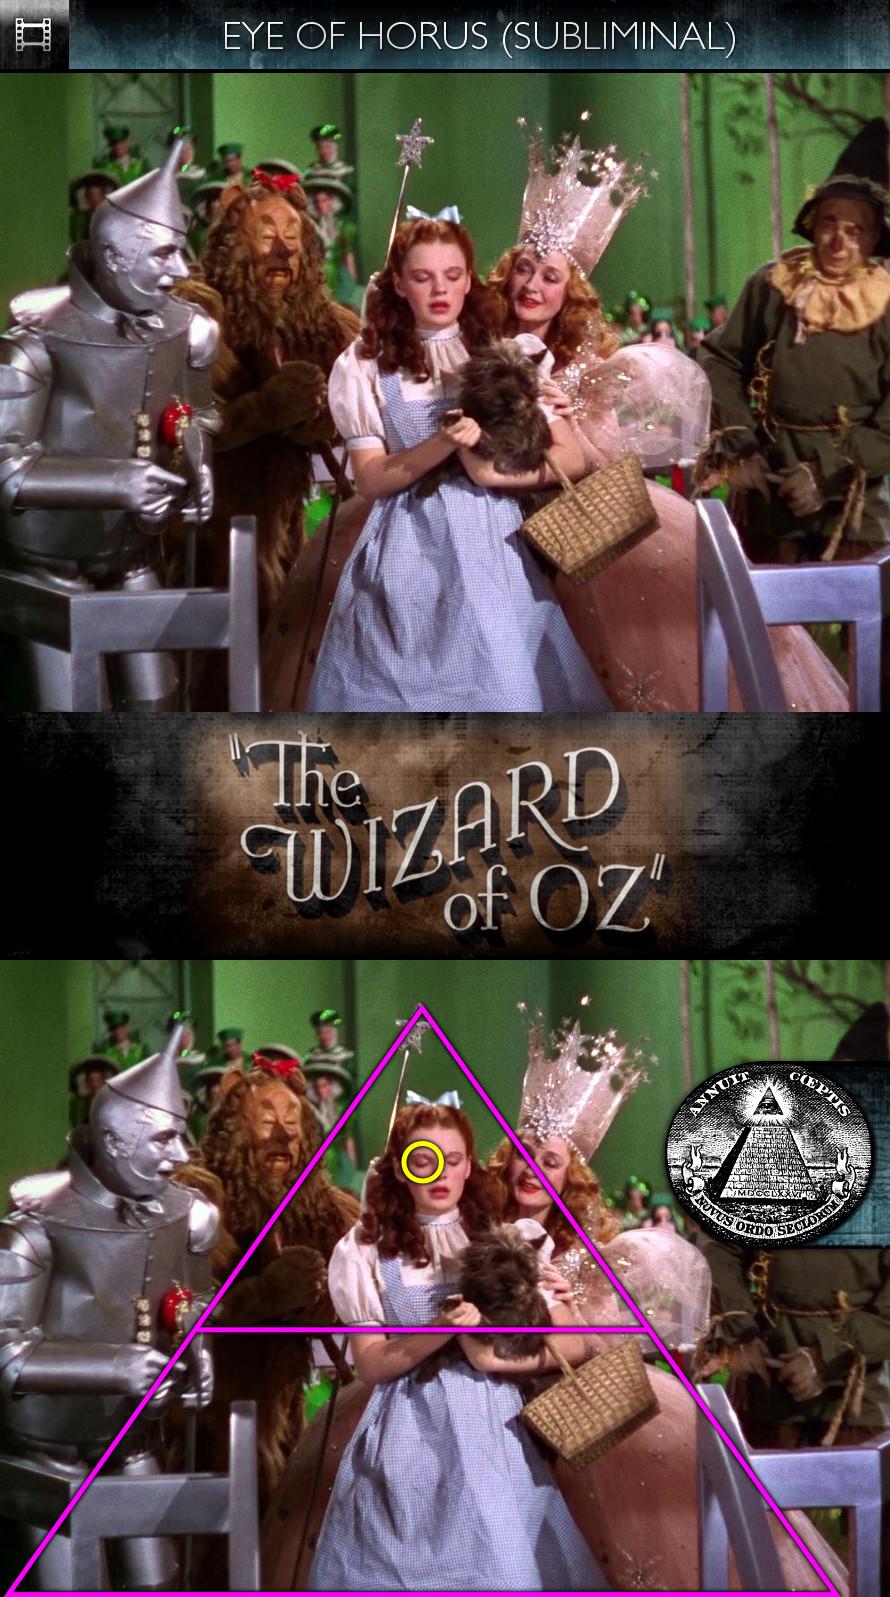 The Wizard of Oz (1939) - Eye of Horus - Subliminal